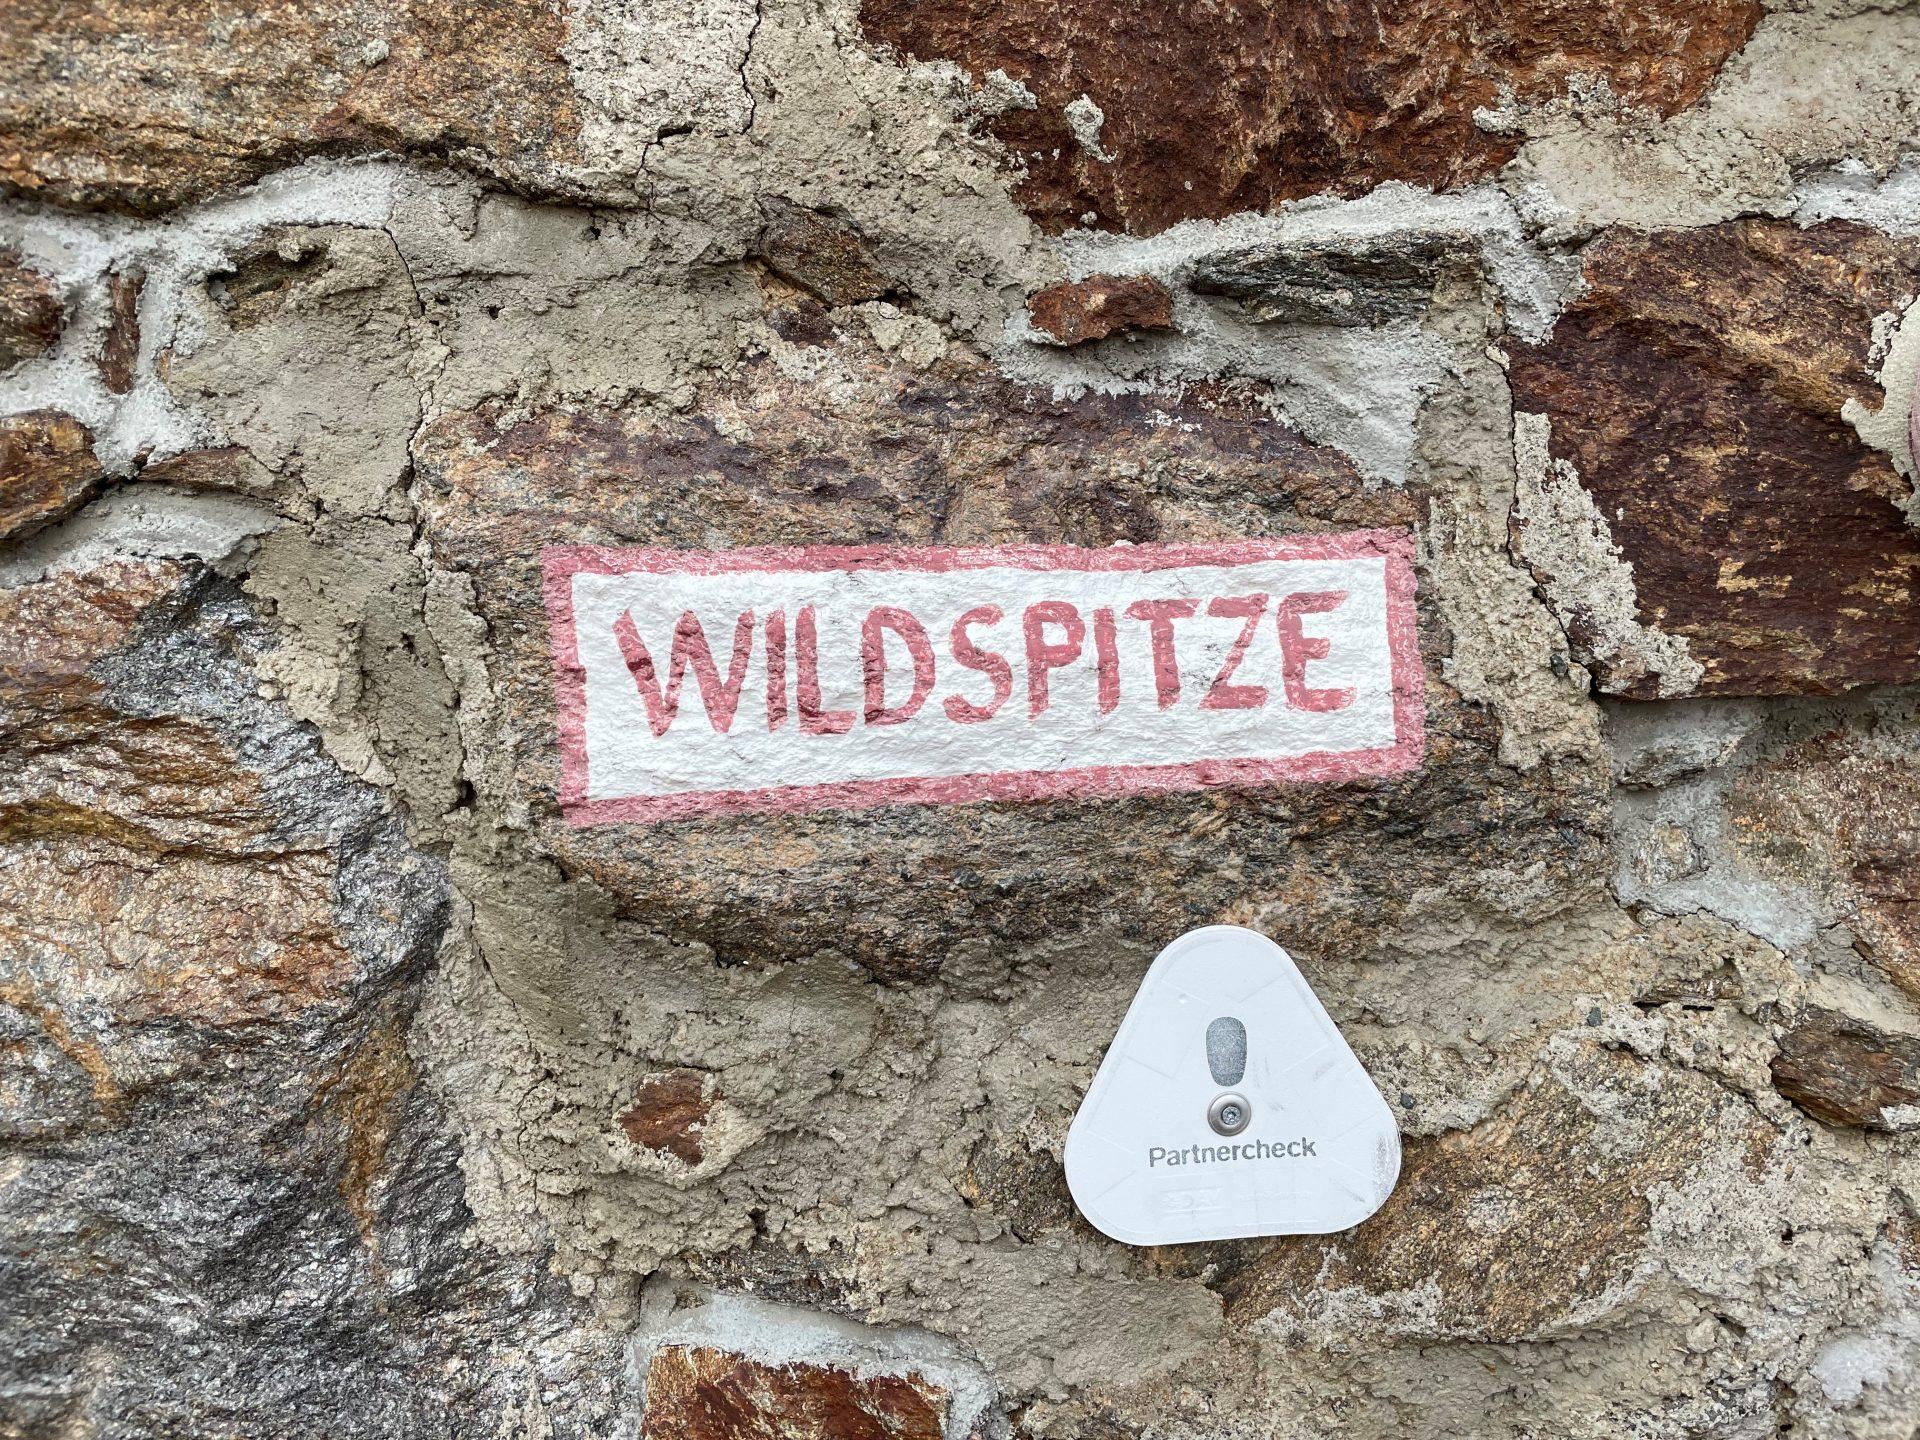 Wild & Spitze ©Andrea Wisthaler